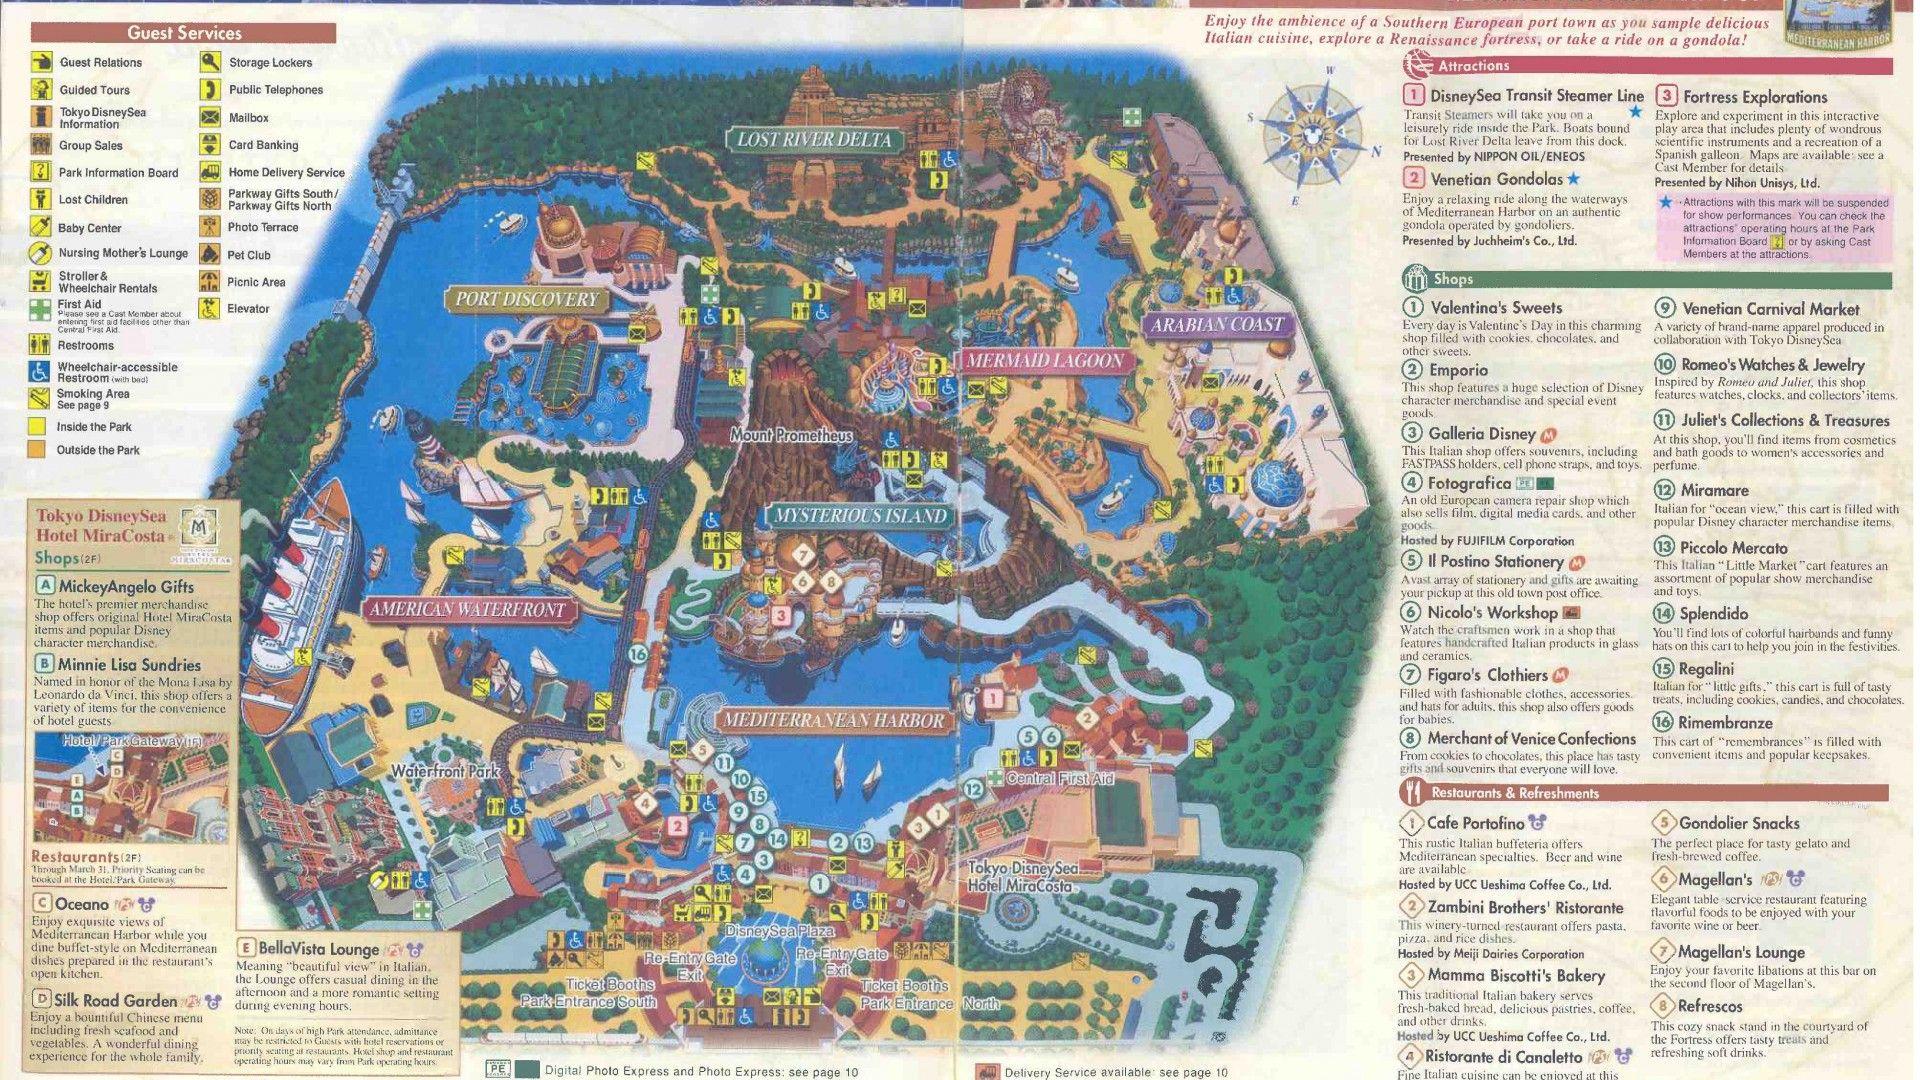 Tokyo Disneysea Is A 176 Acre (7122 Ha) Theme Park At